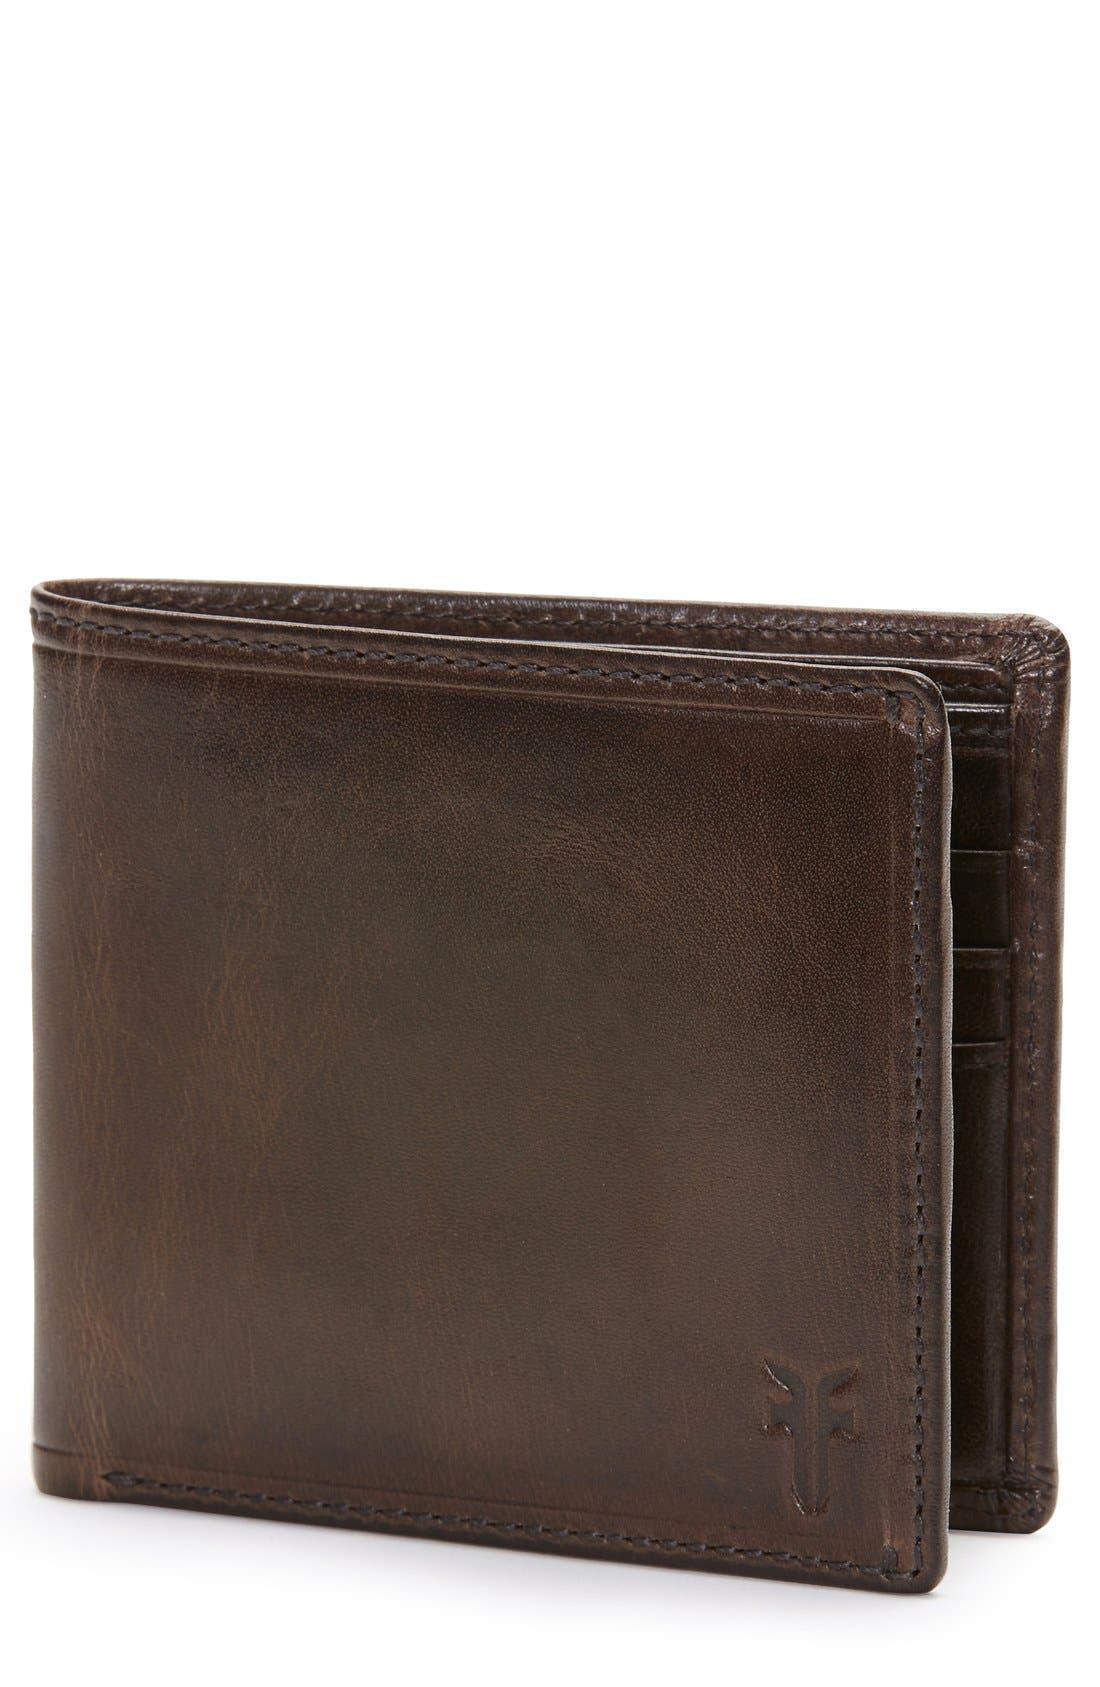 'Logan' Leather Billfold Wallet,                         Main,                         color, Dark Brown